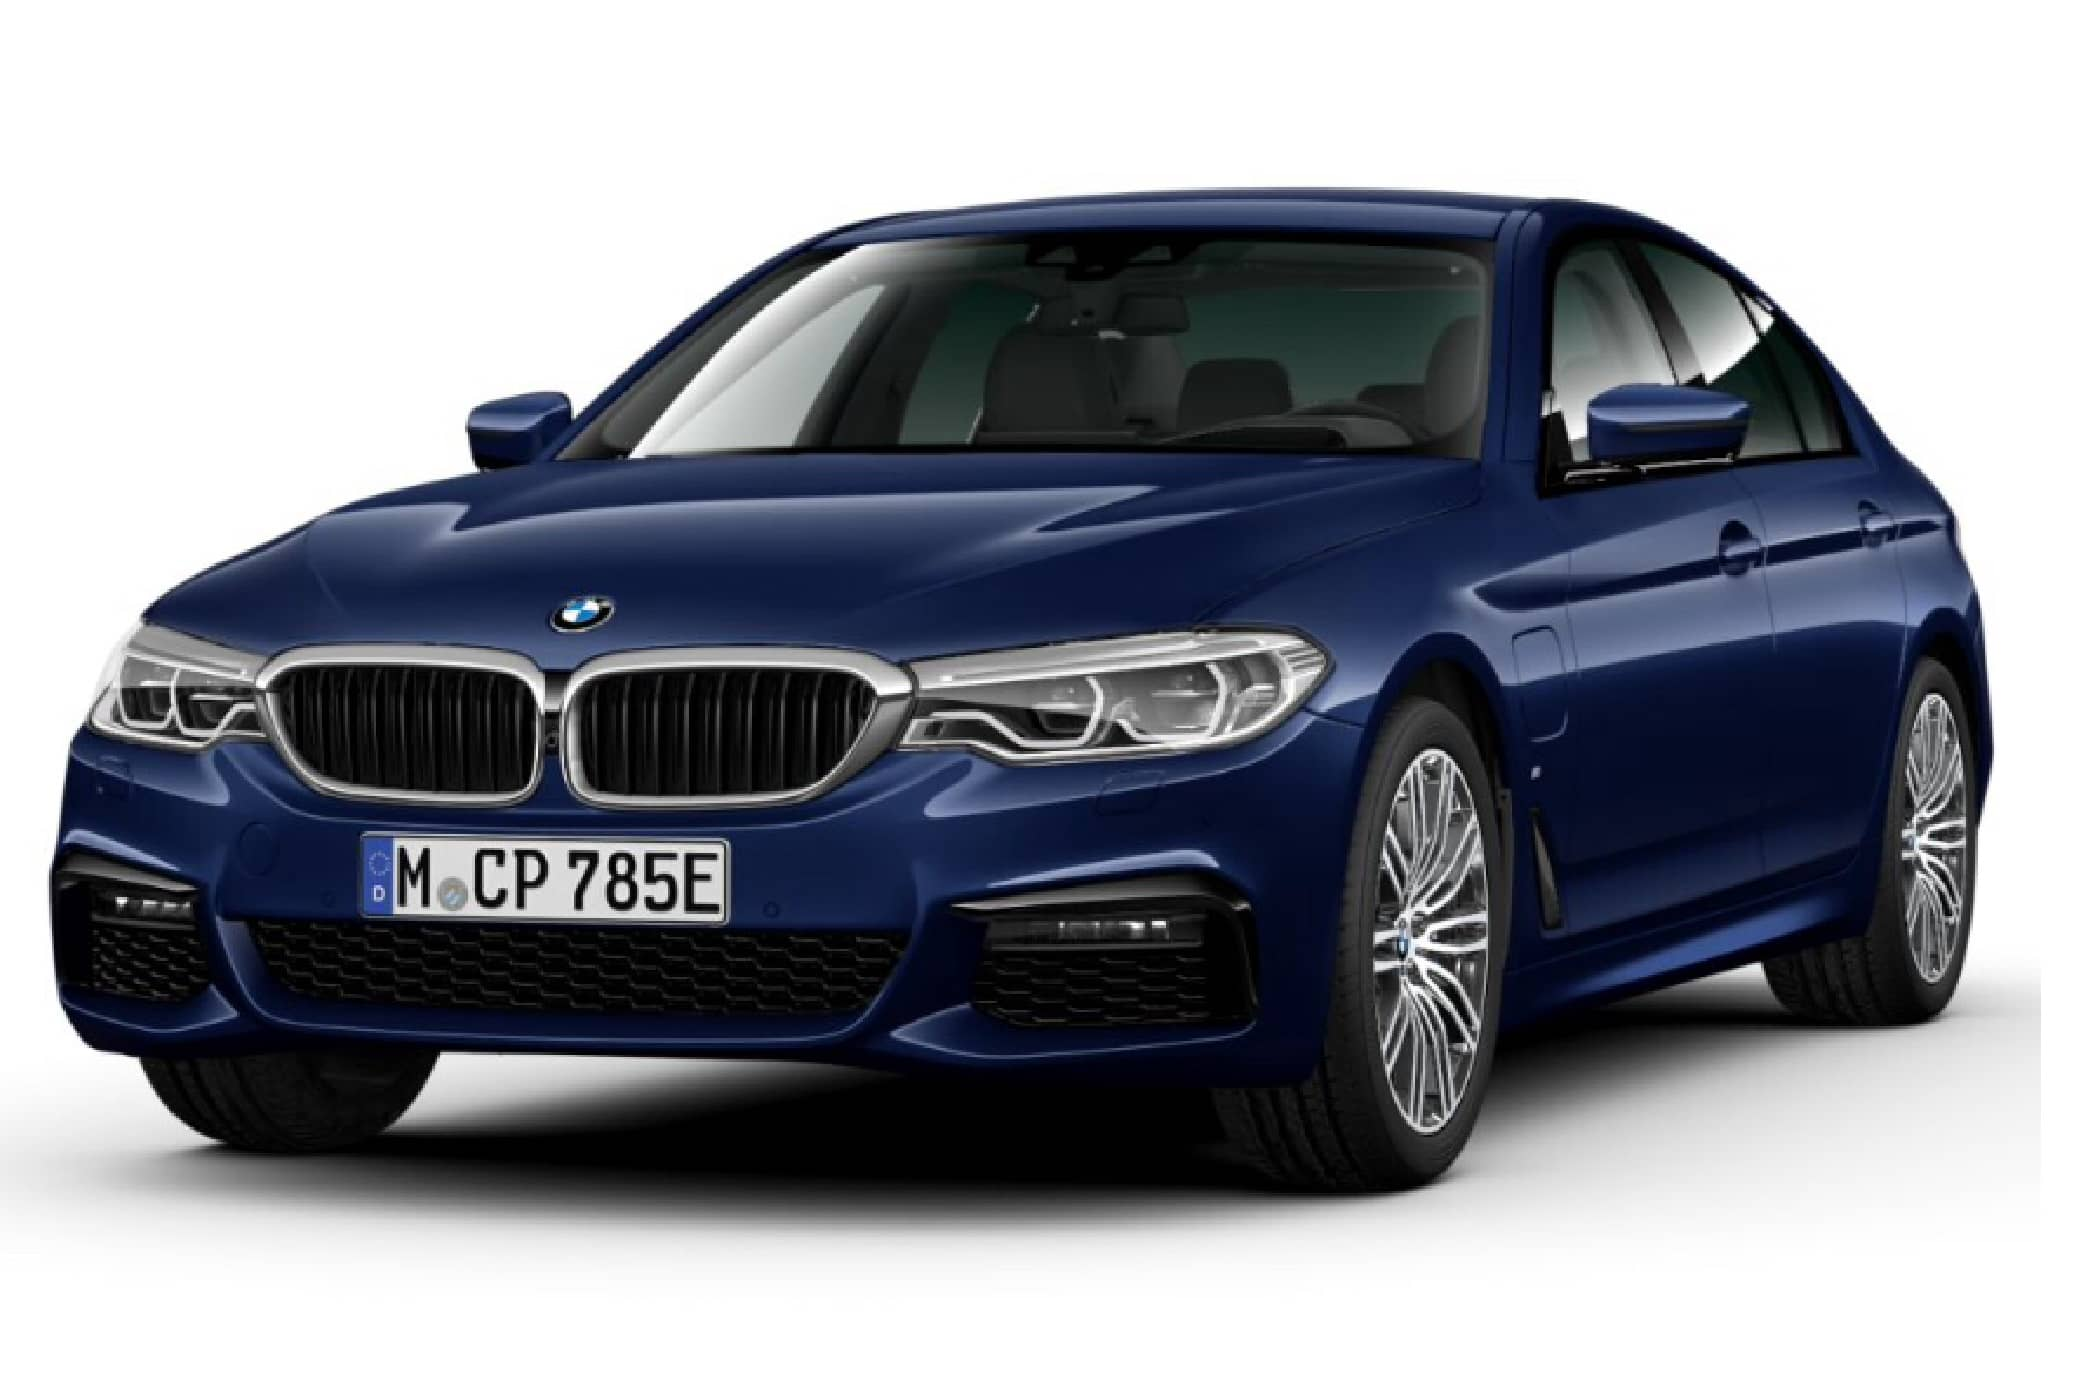 Ремонт рулевой рейки BMW серии 5